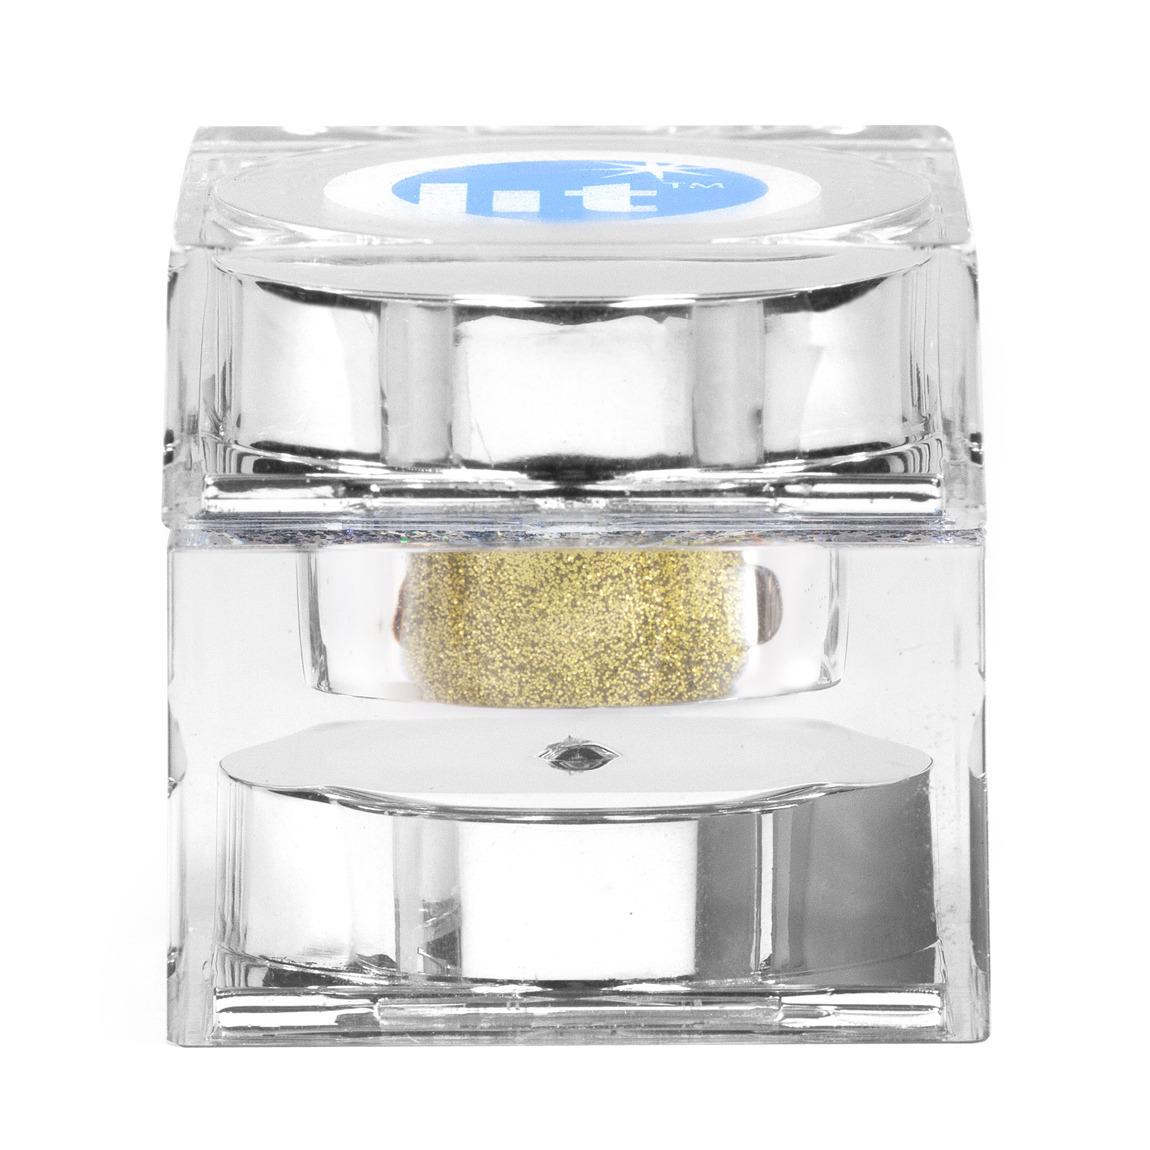 Lit Cosmetics Lit Glitter Plush S2 alternative view 1.